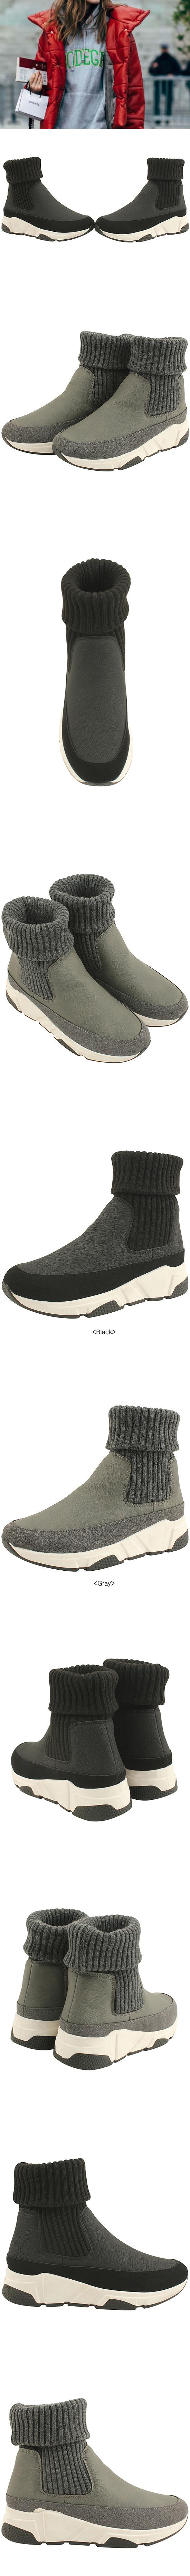 Fur Knit Span High Top Sneakers Gray